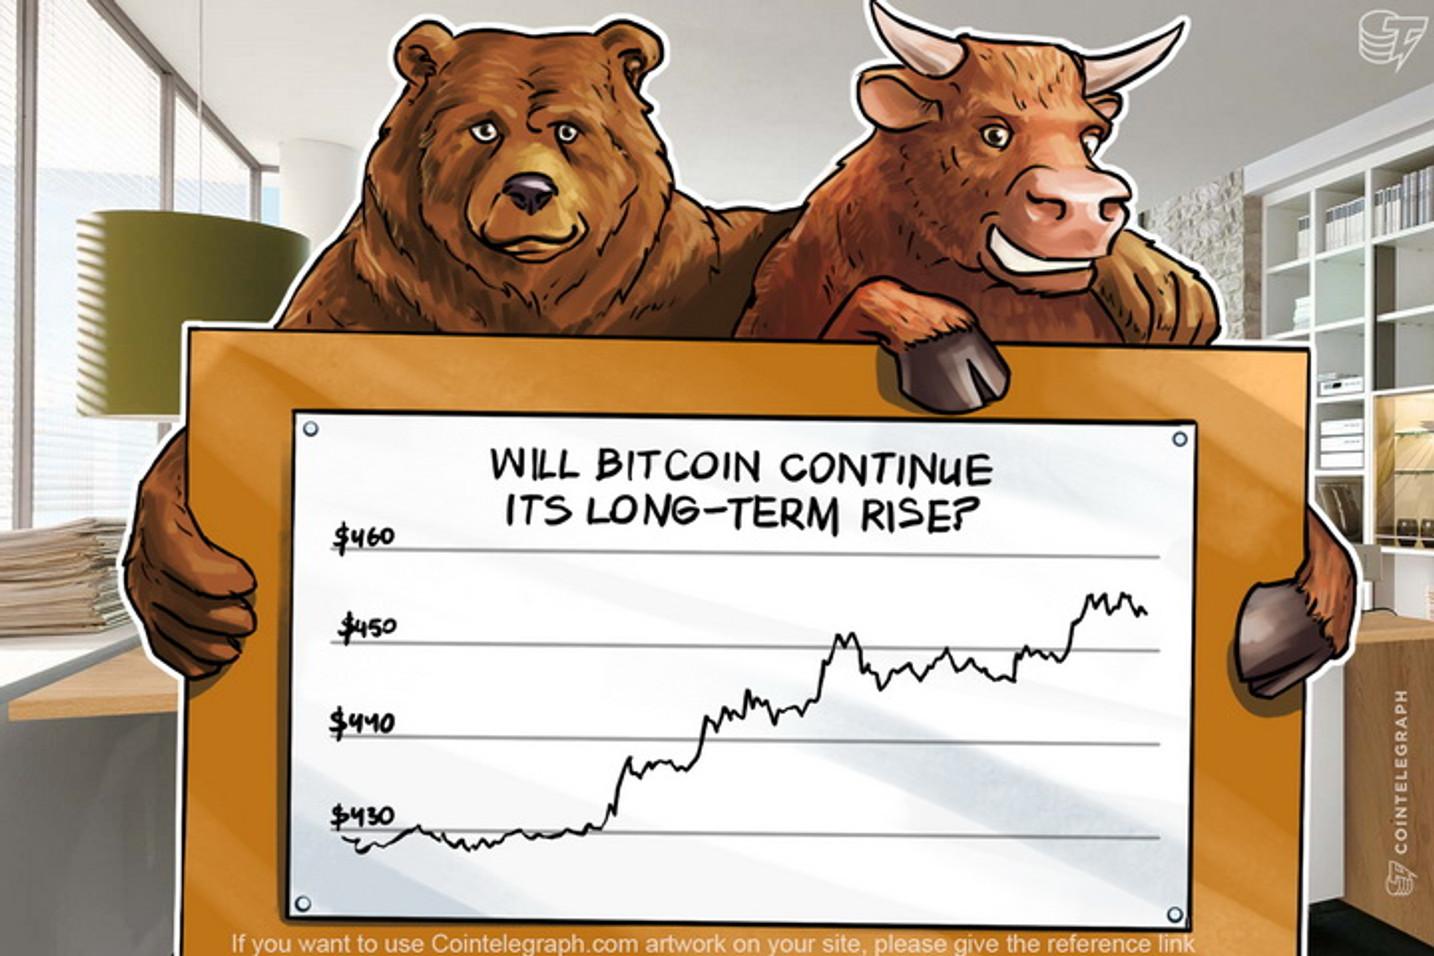 Bitcoin Price Analysis (Week of April 24th)